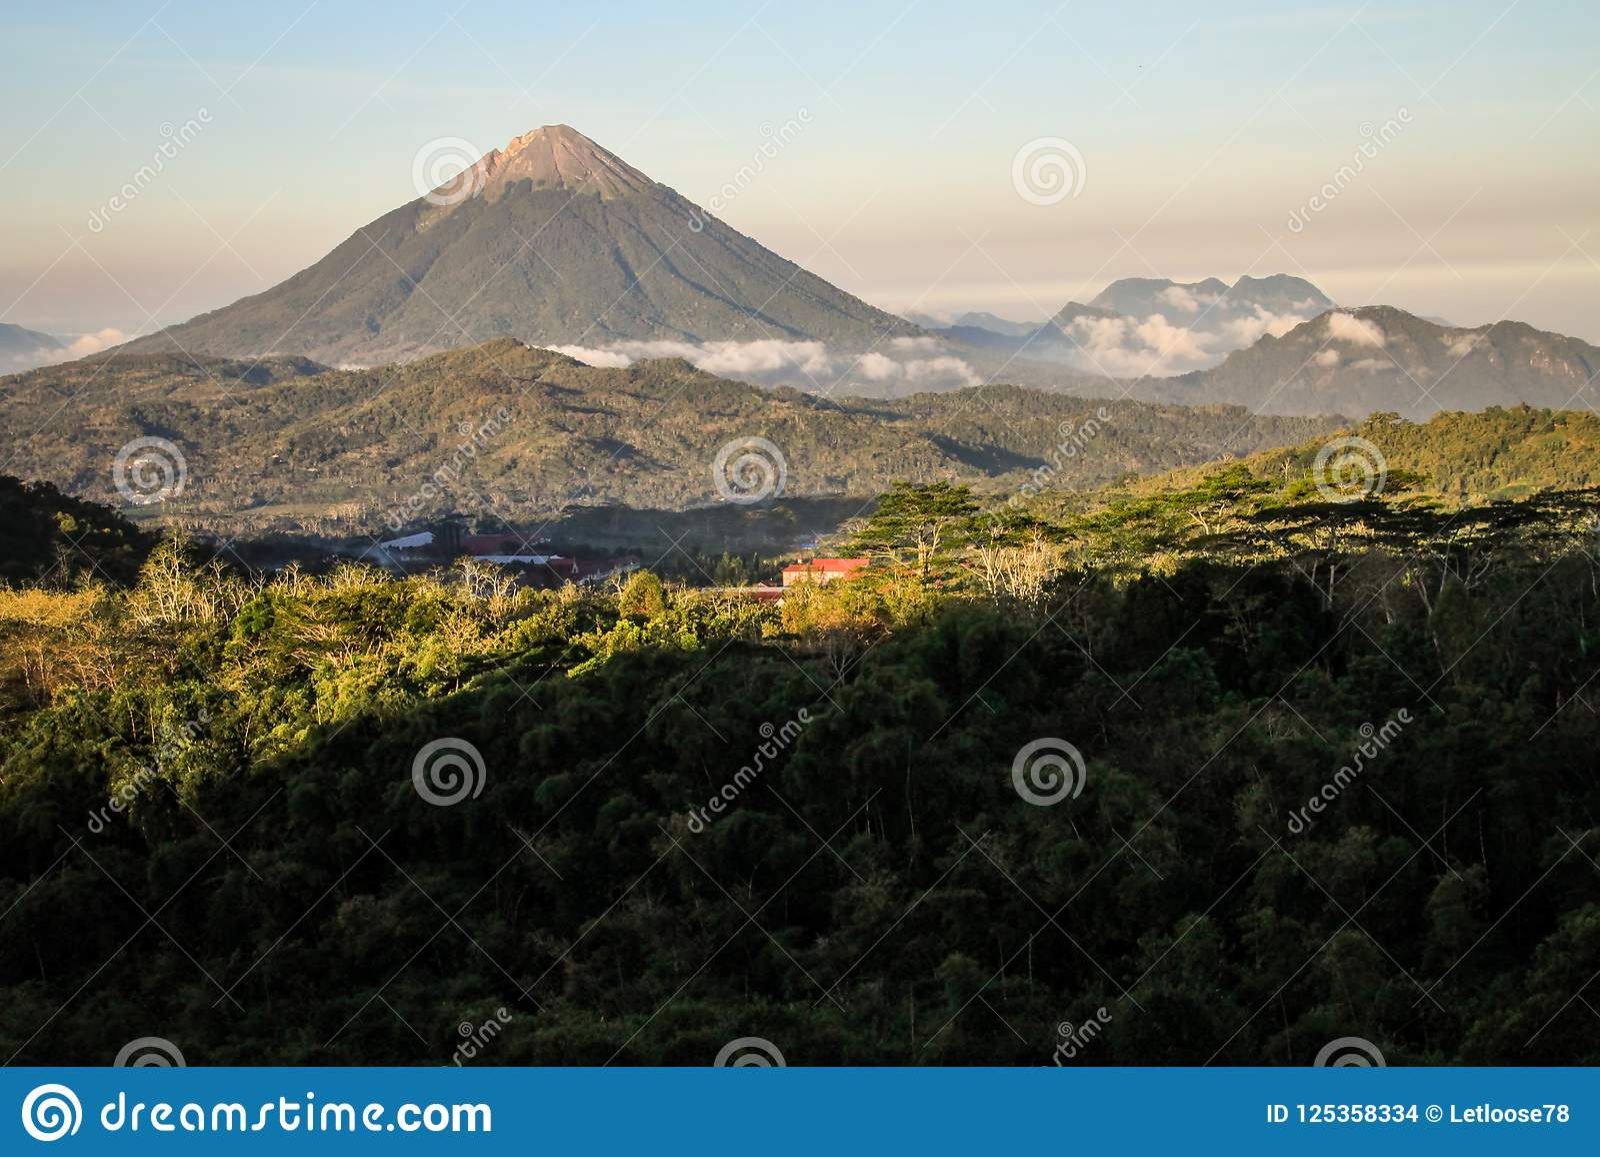 Der Inierie-Vulkan bei Sonnenuntergang, Nusa Tenggara, Flores-Insel, Indonesien